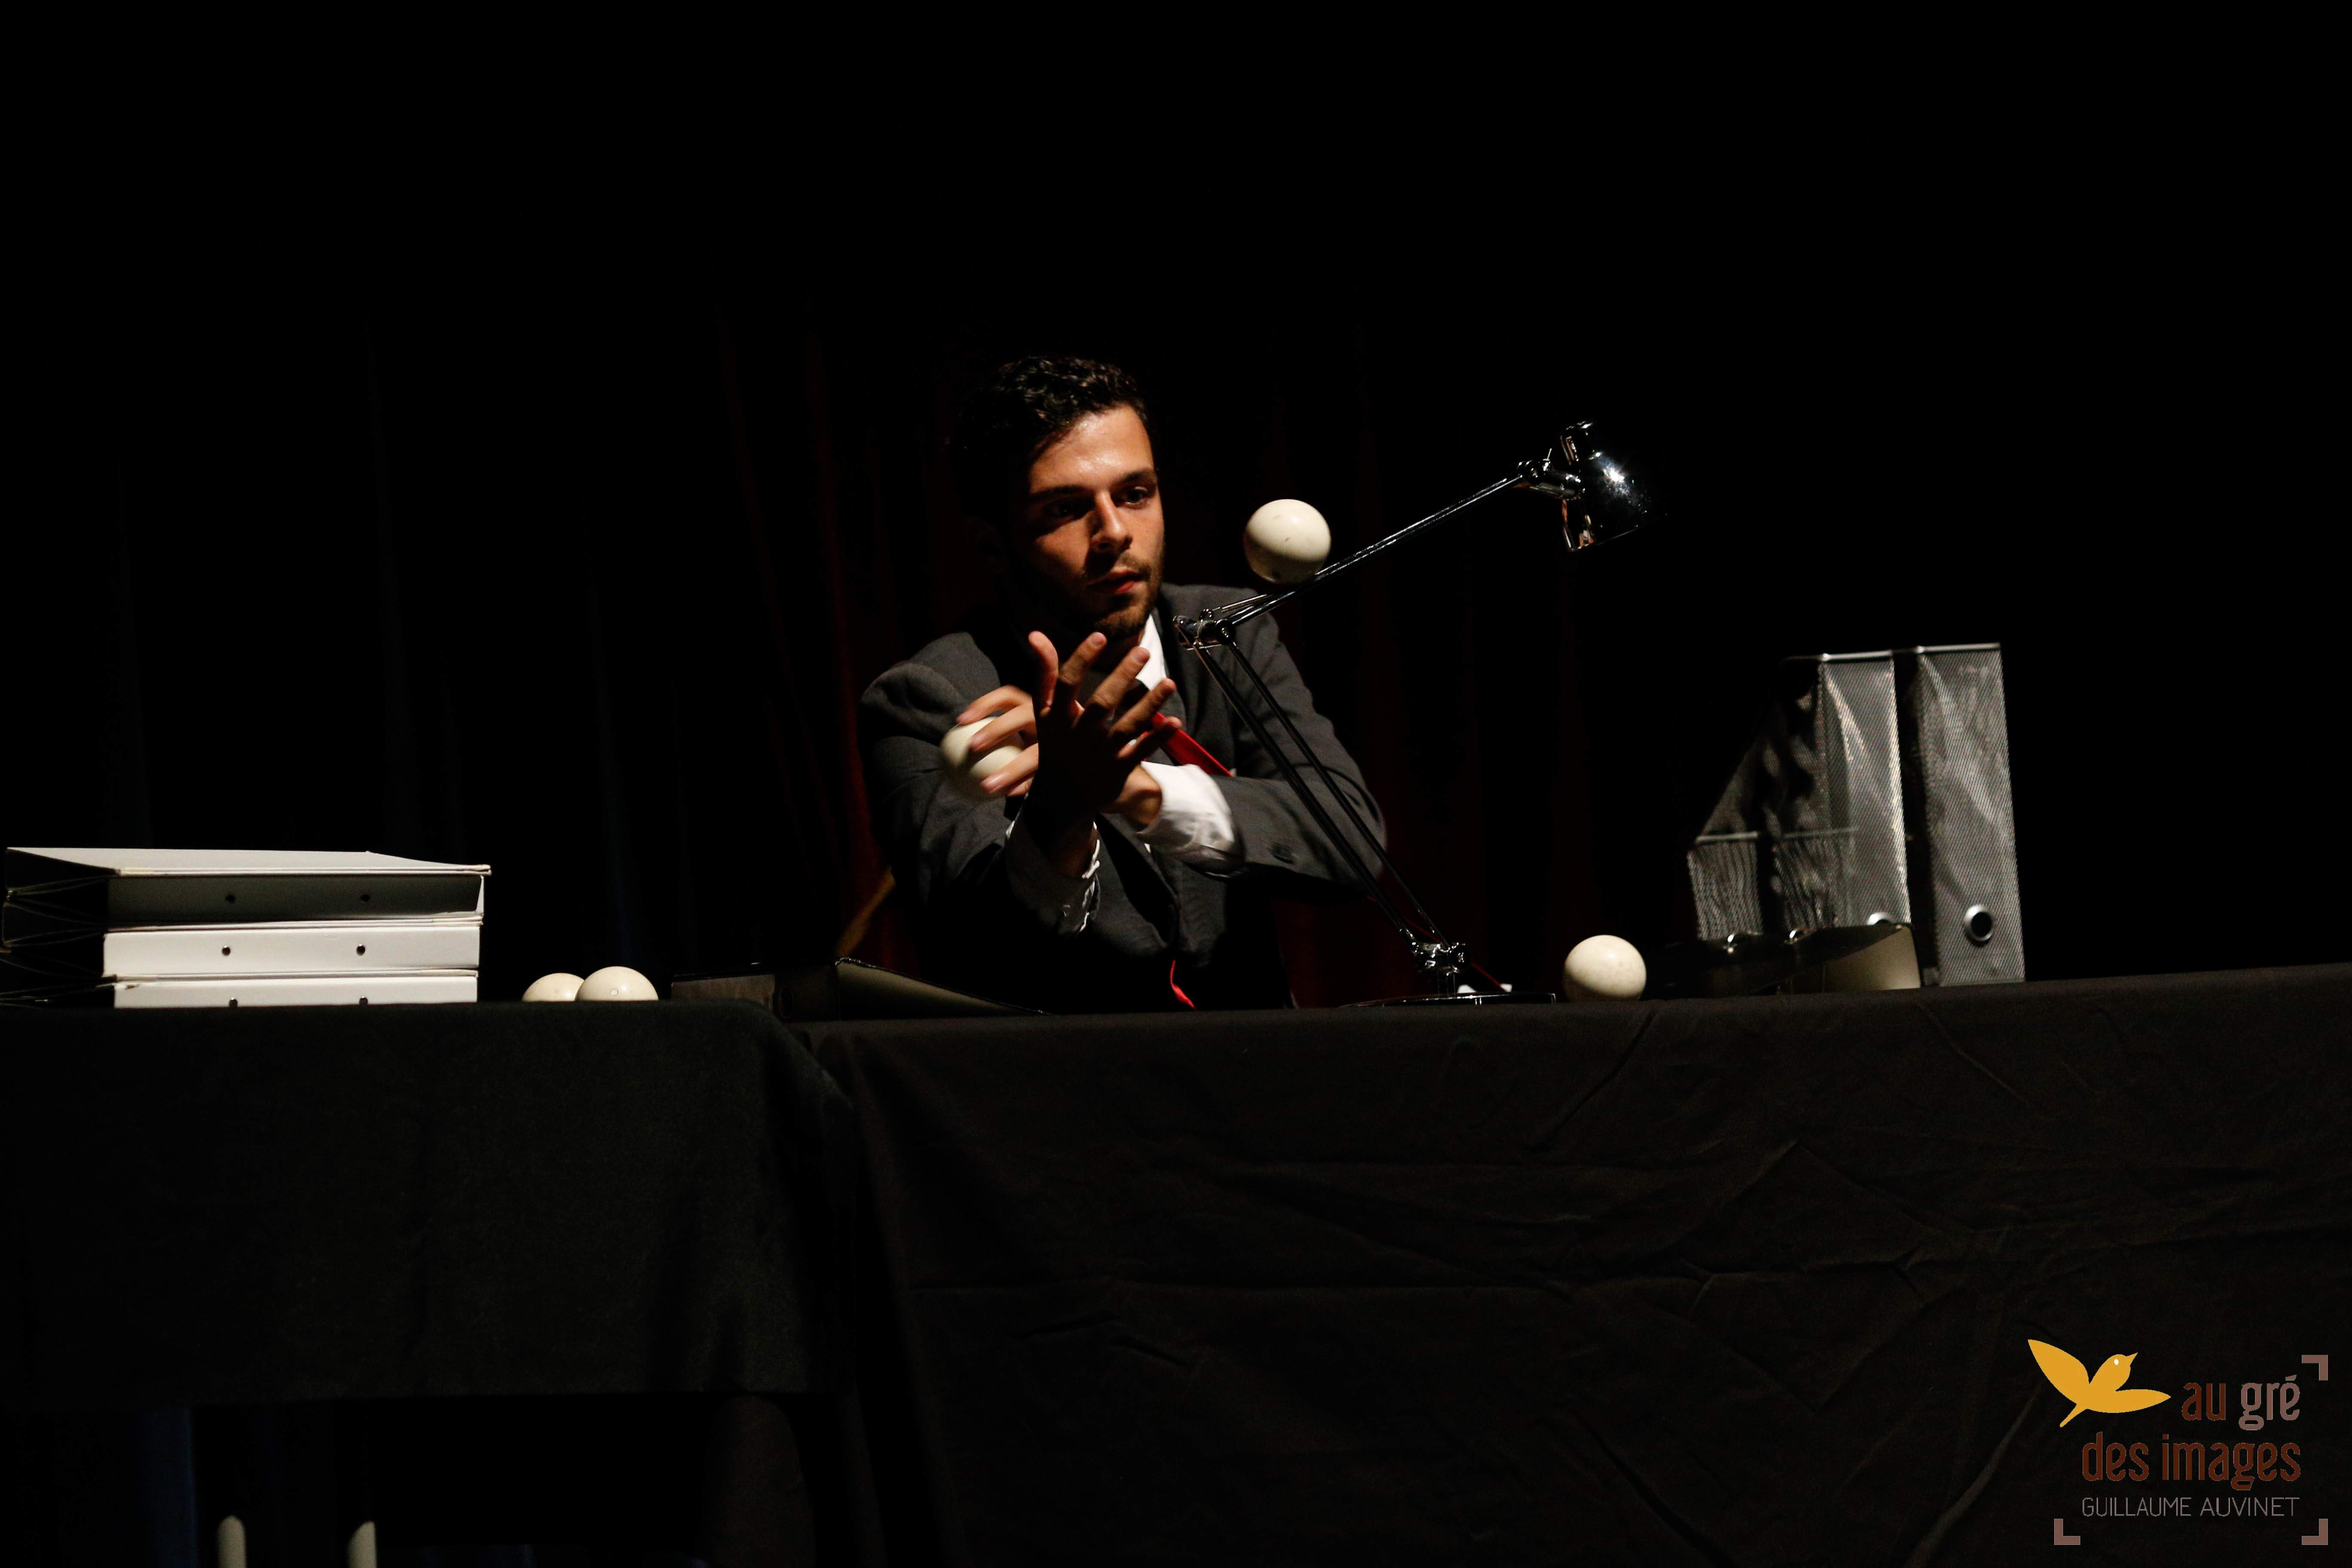 Asaf Mor - Nine To Five - Solo clownesque de jonglerie dansée